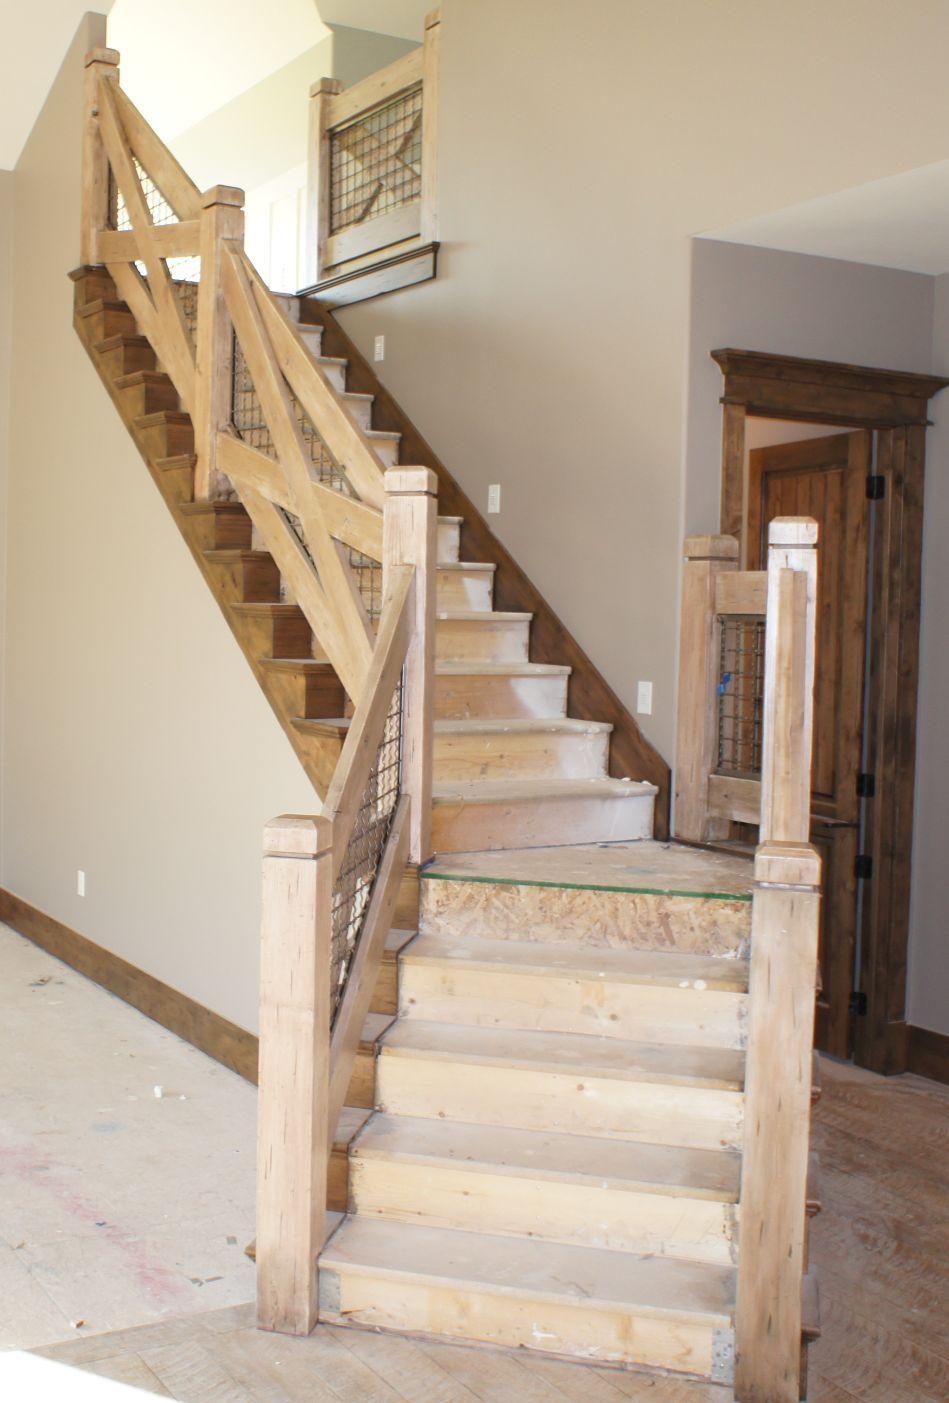 Stair railing in draper utah basement pinterest for Step railing